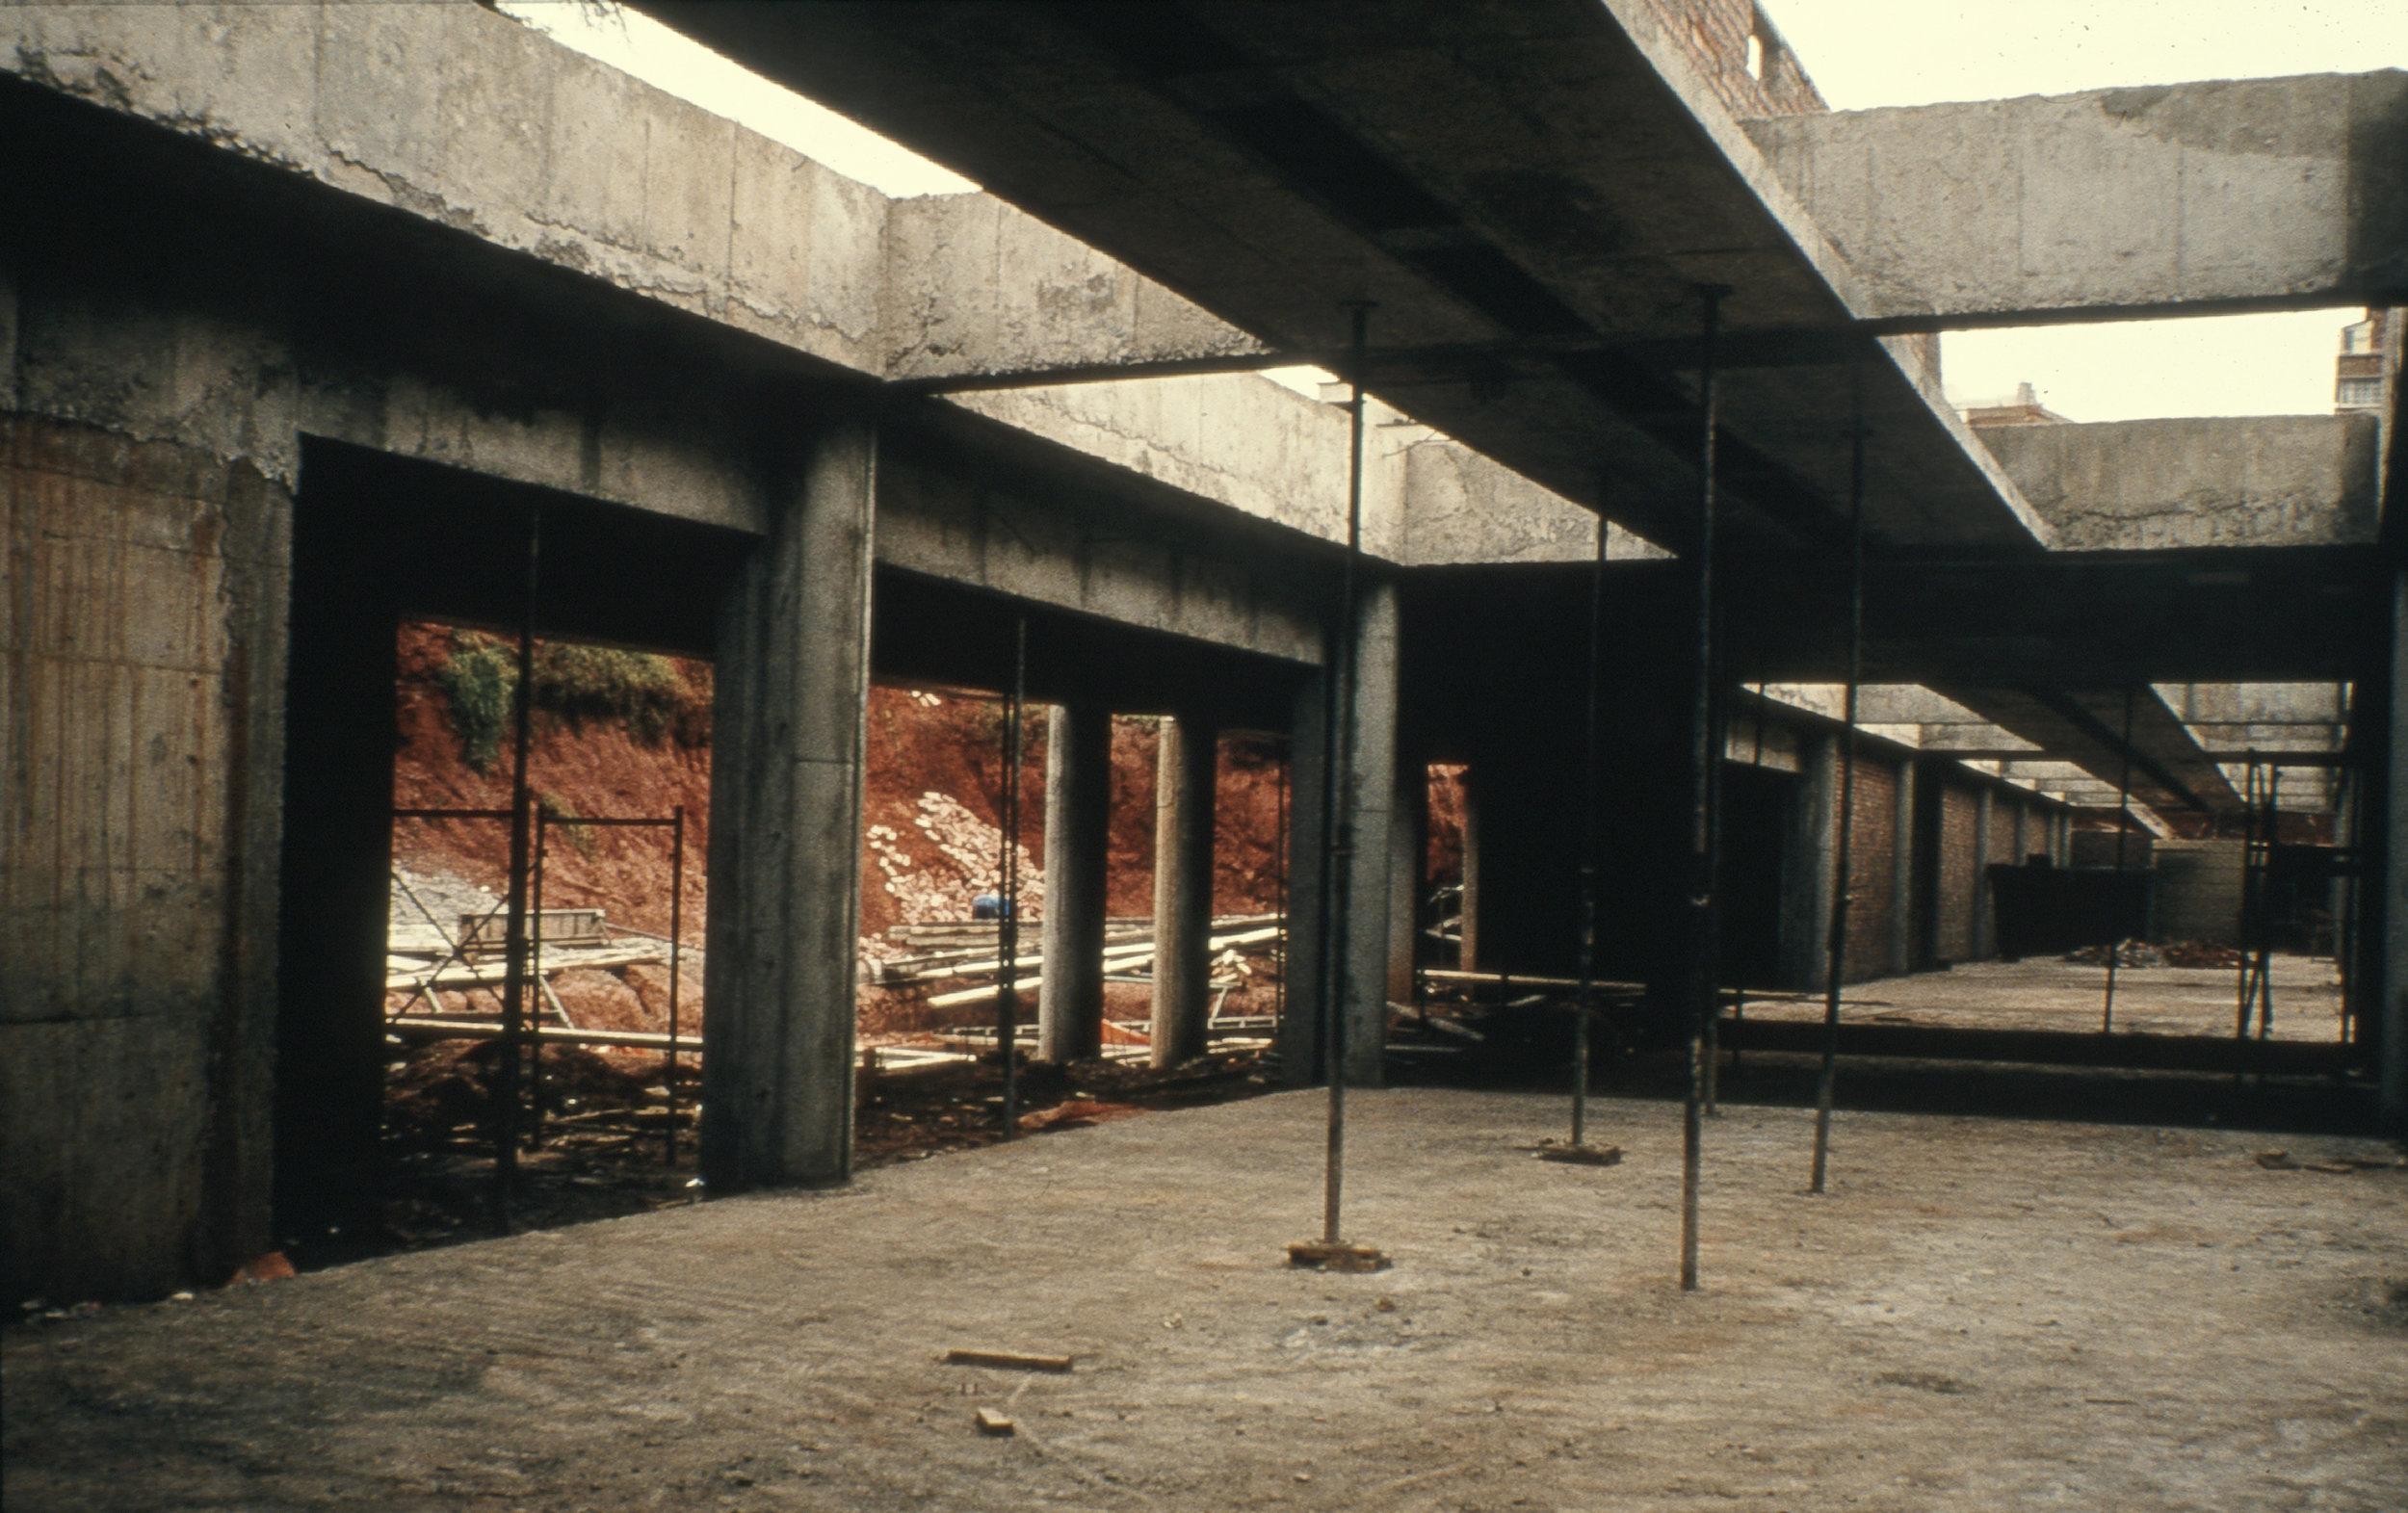 Johannesburg Art Gallery's Meyer Pienaar Extension under construction